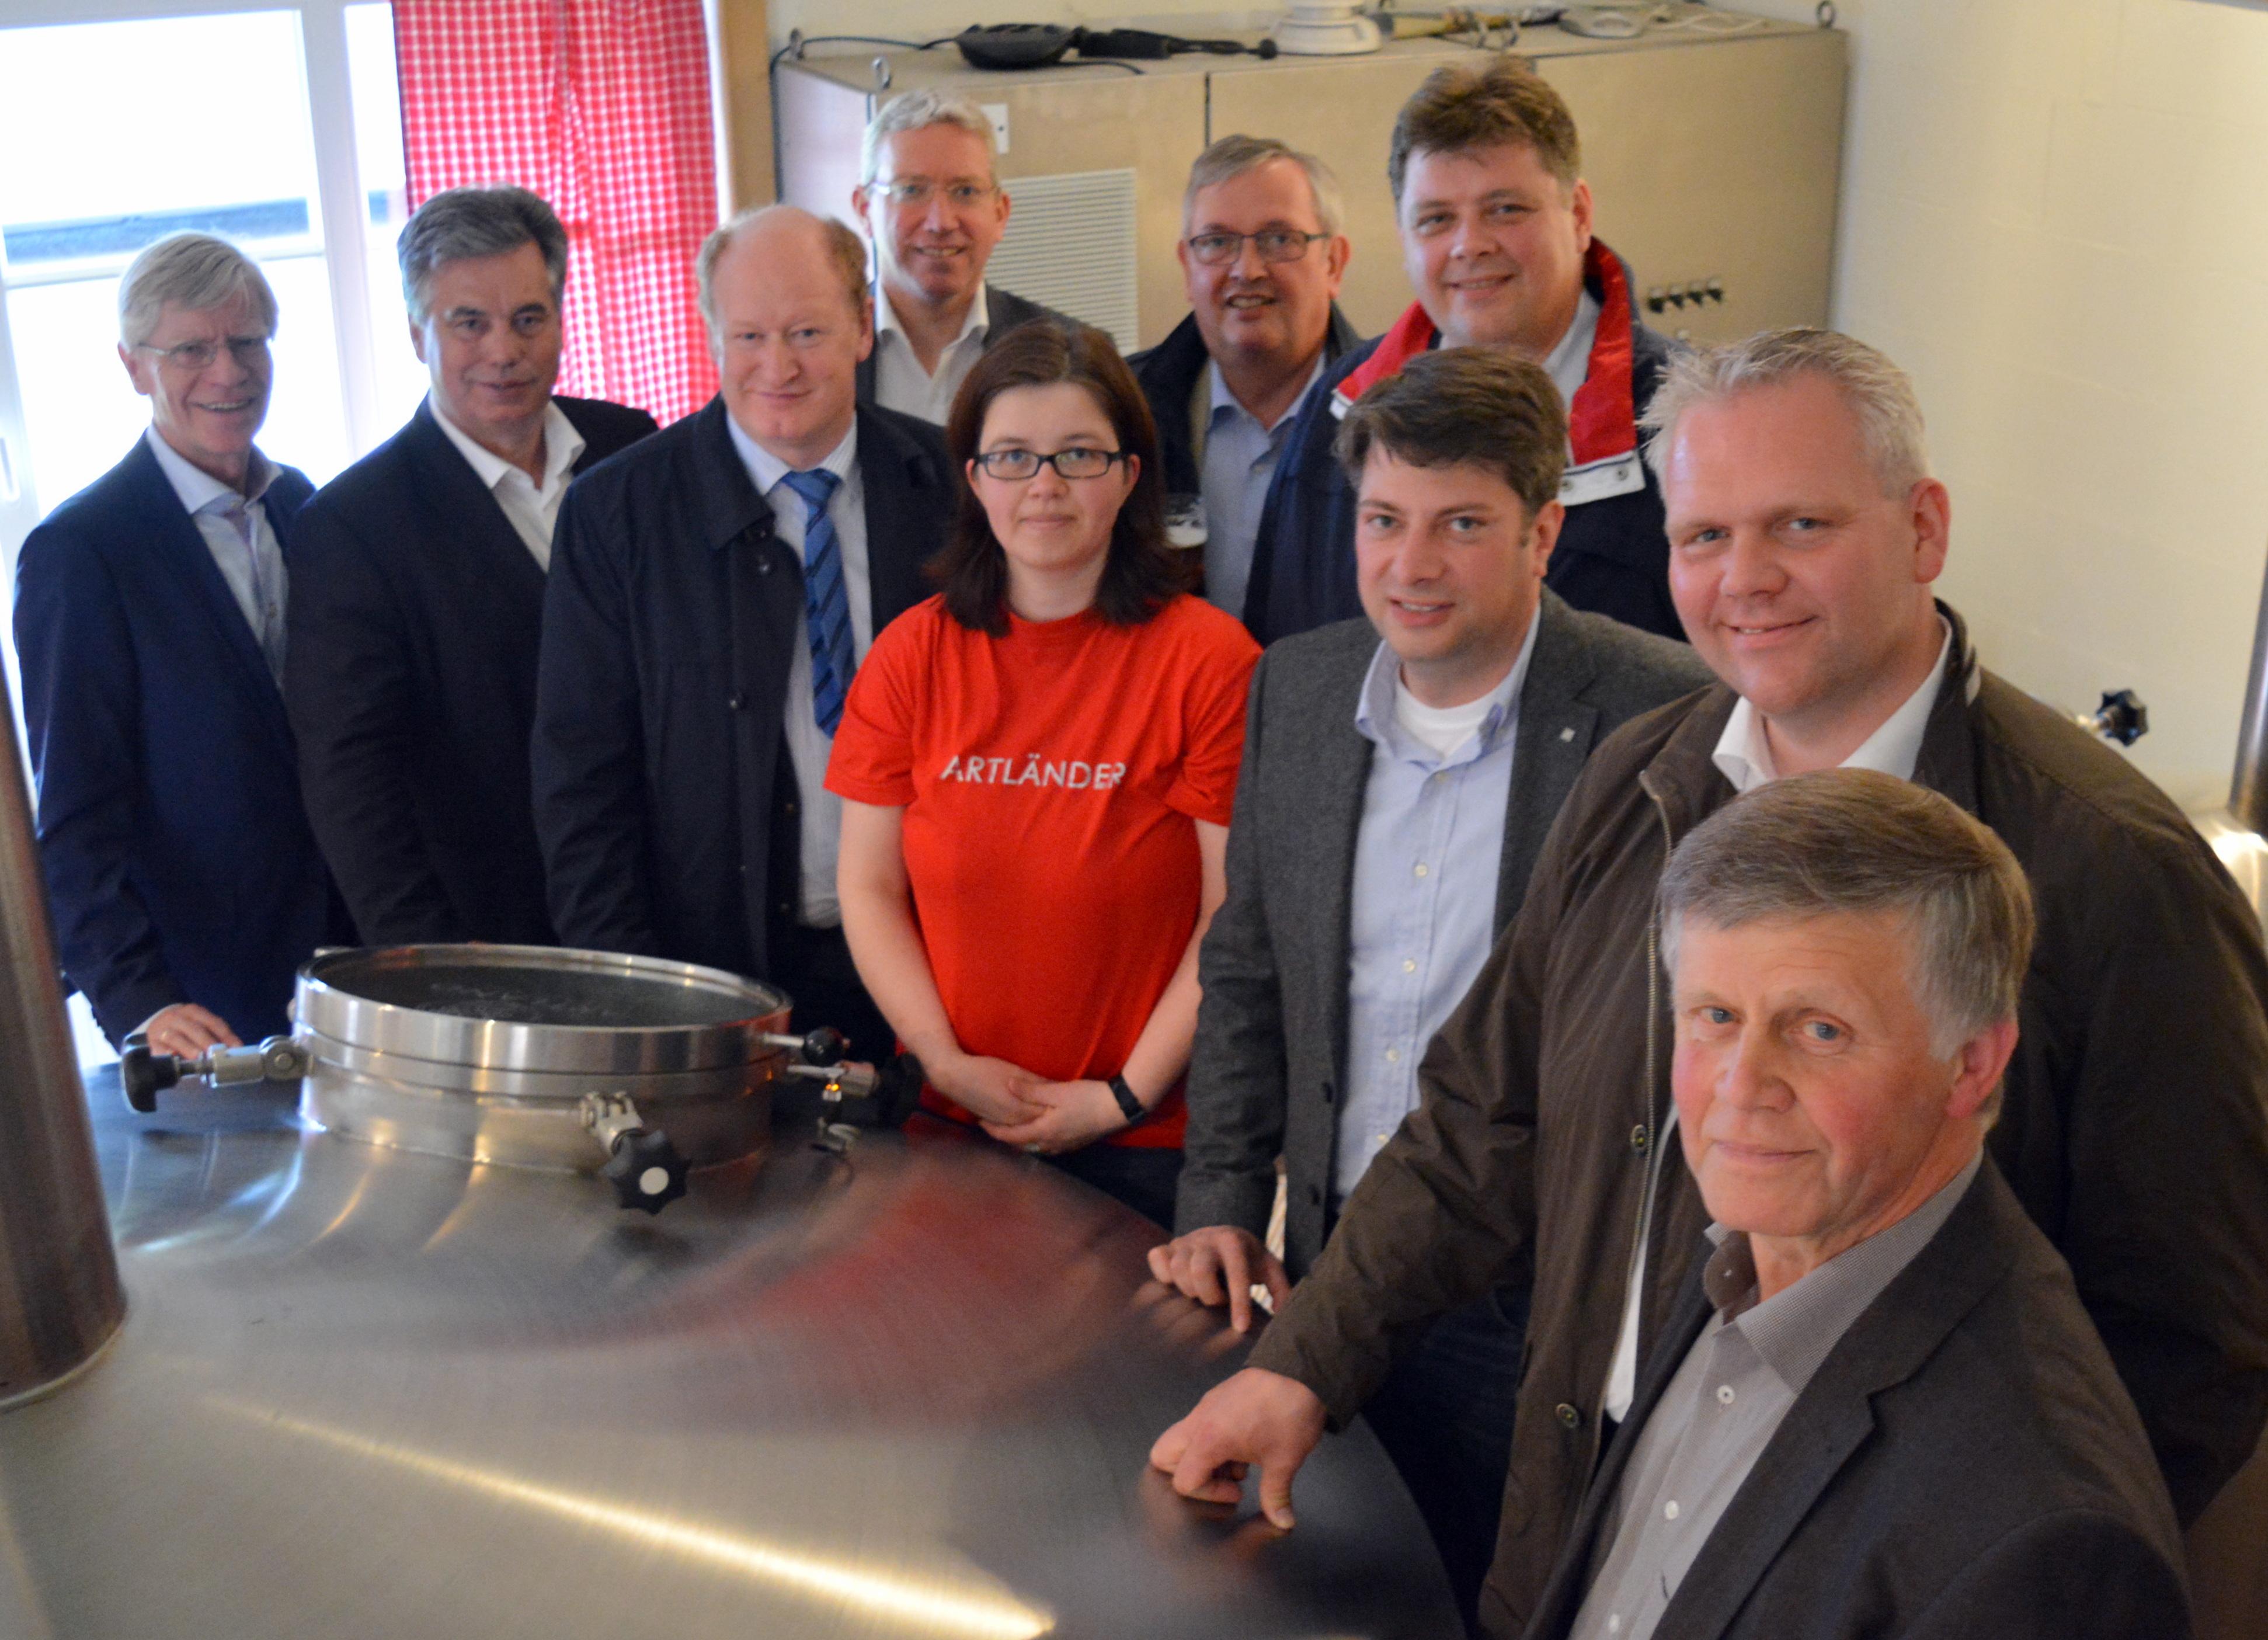 2016: Fraktionsabend der CDU-Landtagsfraktion in der Artland-Brauerei Nortrup.